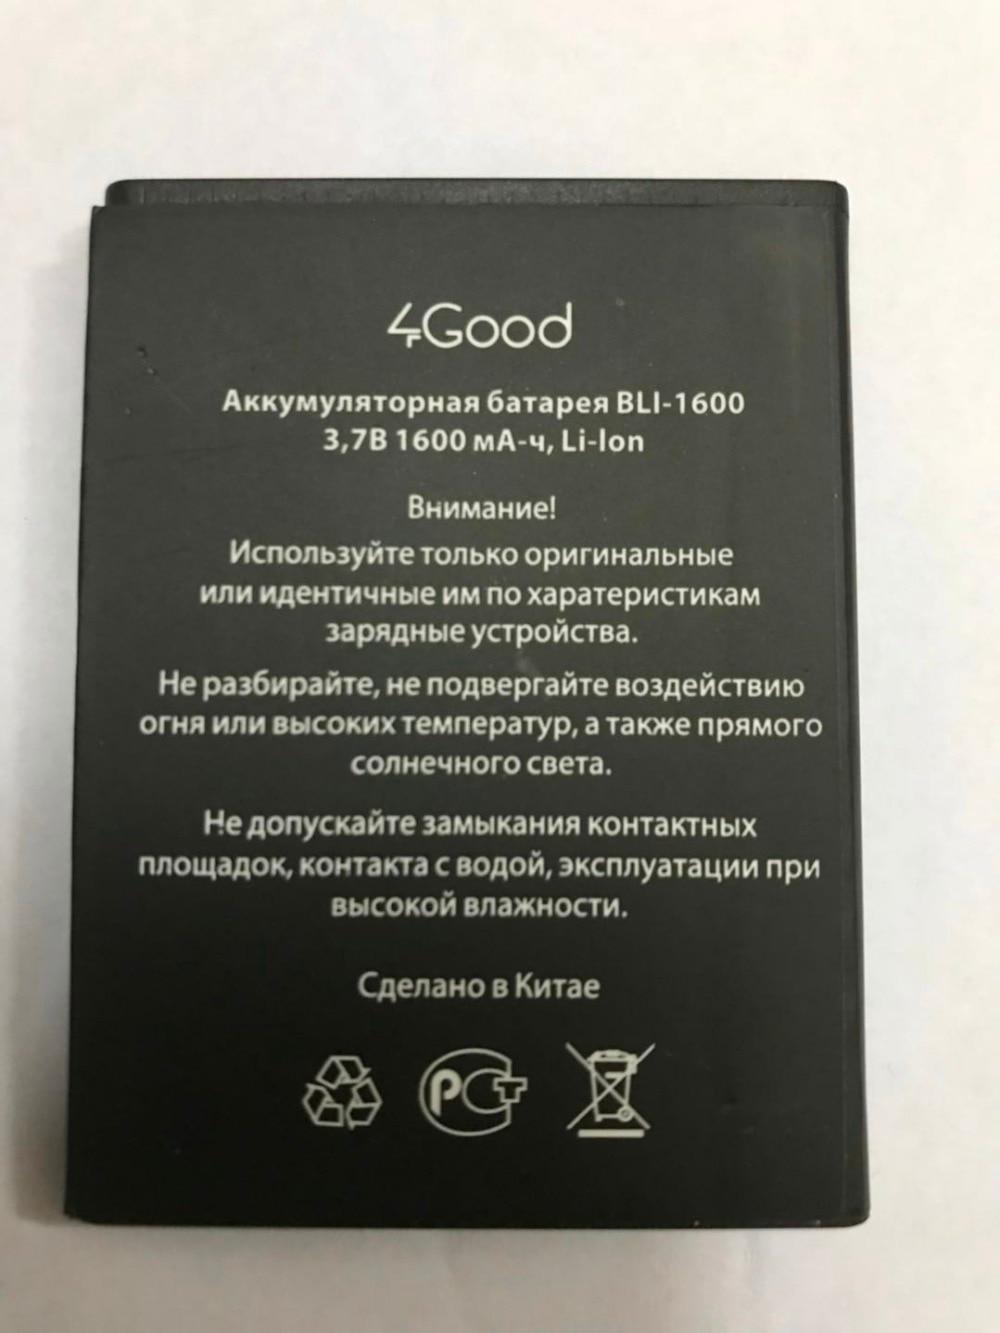 Мобильный телефон для 4 аккумуляторов S450m BLI-1600, аккумулятор 1600 мАч